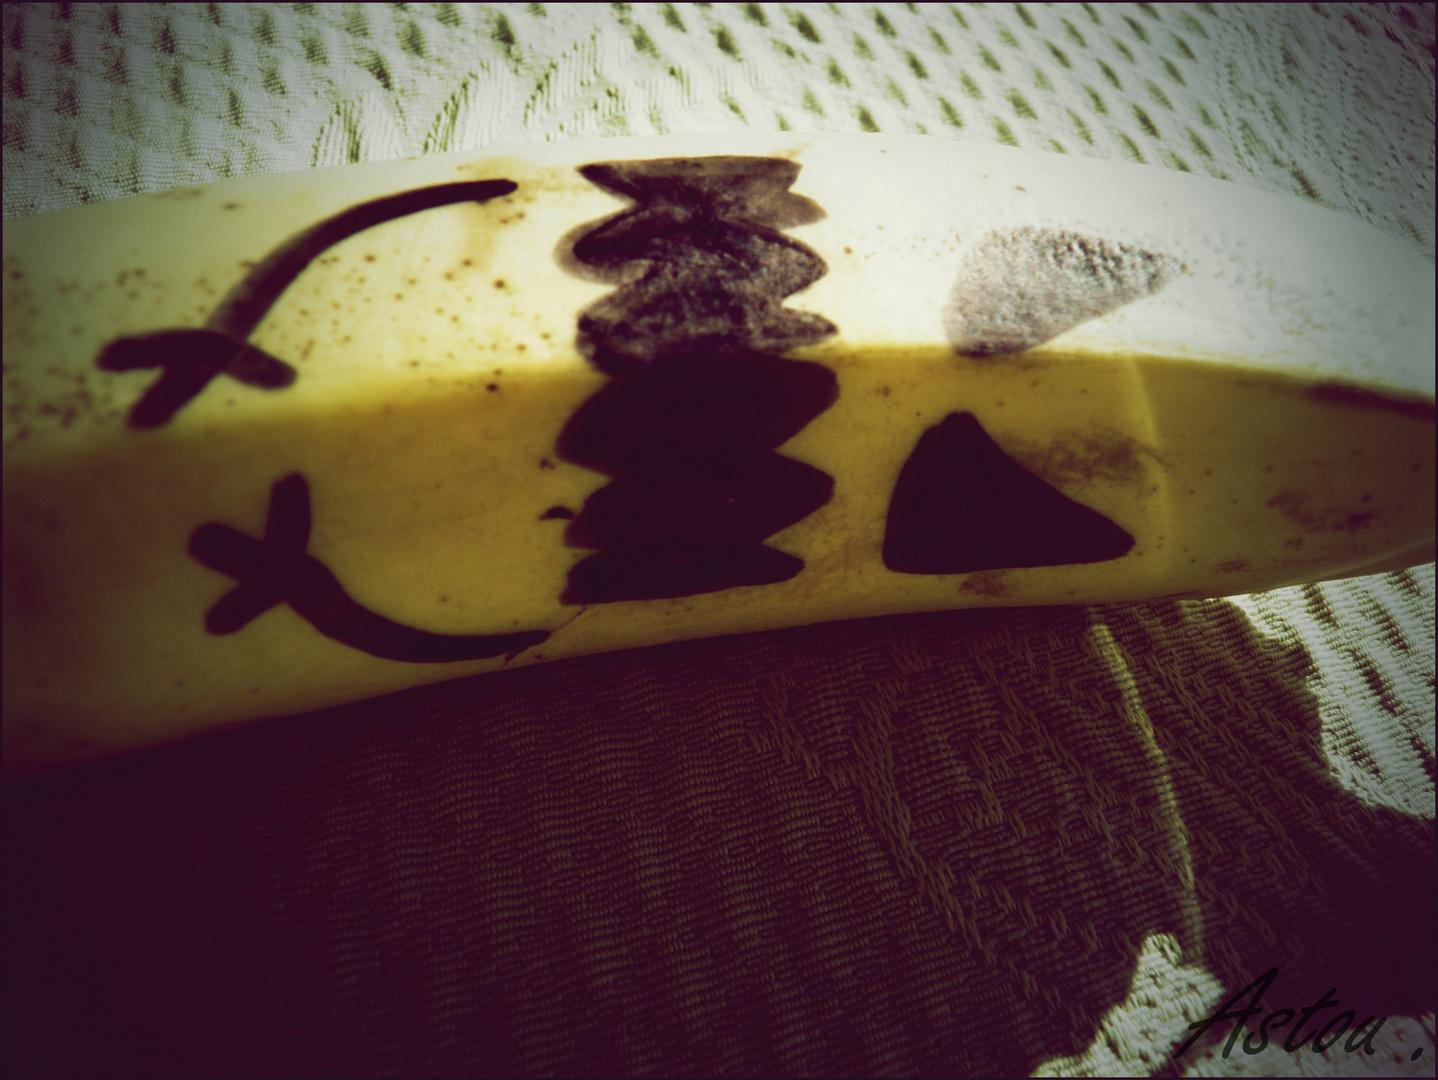 Bad Banana?